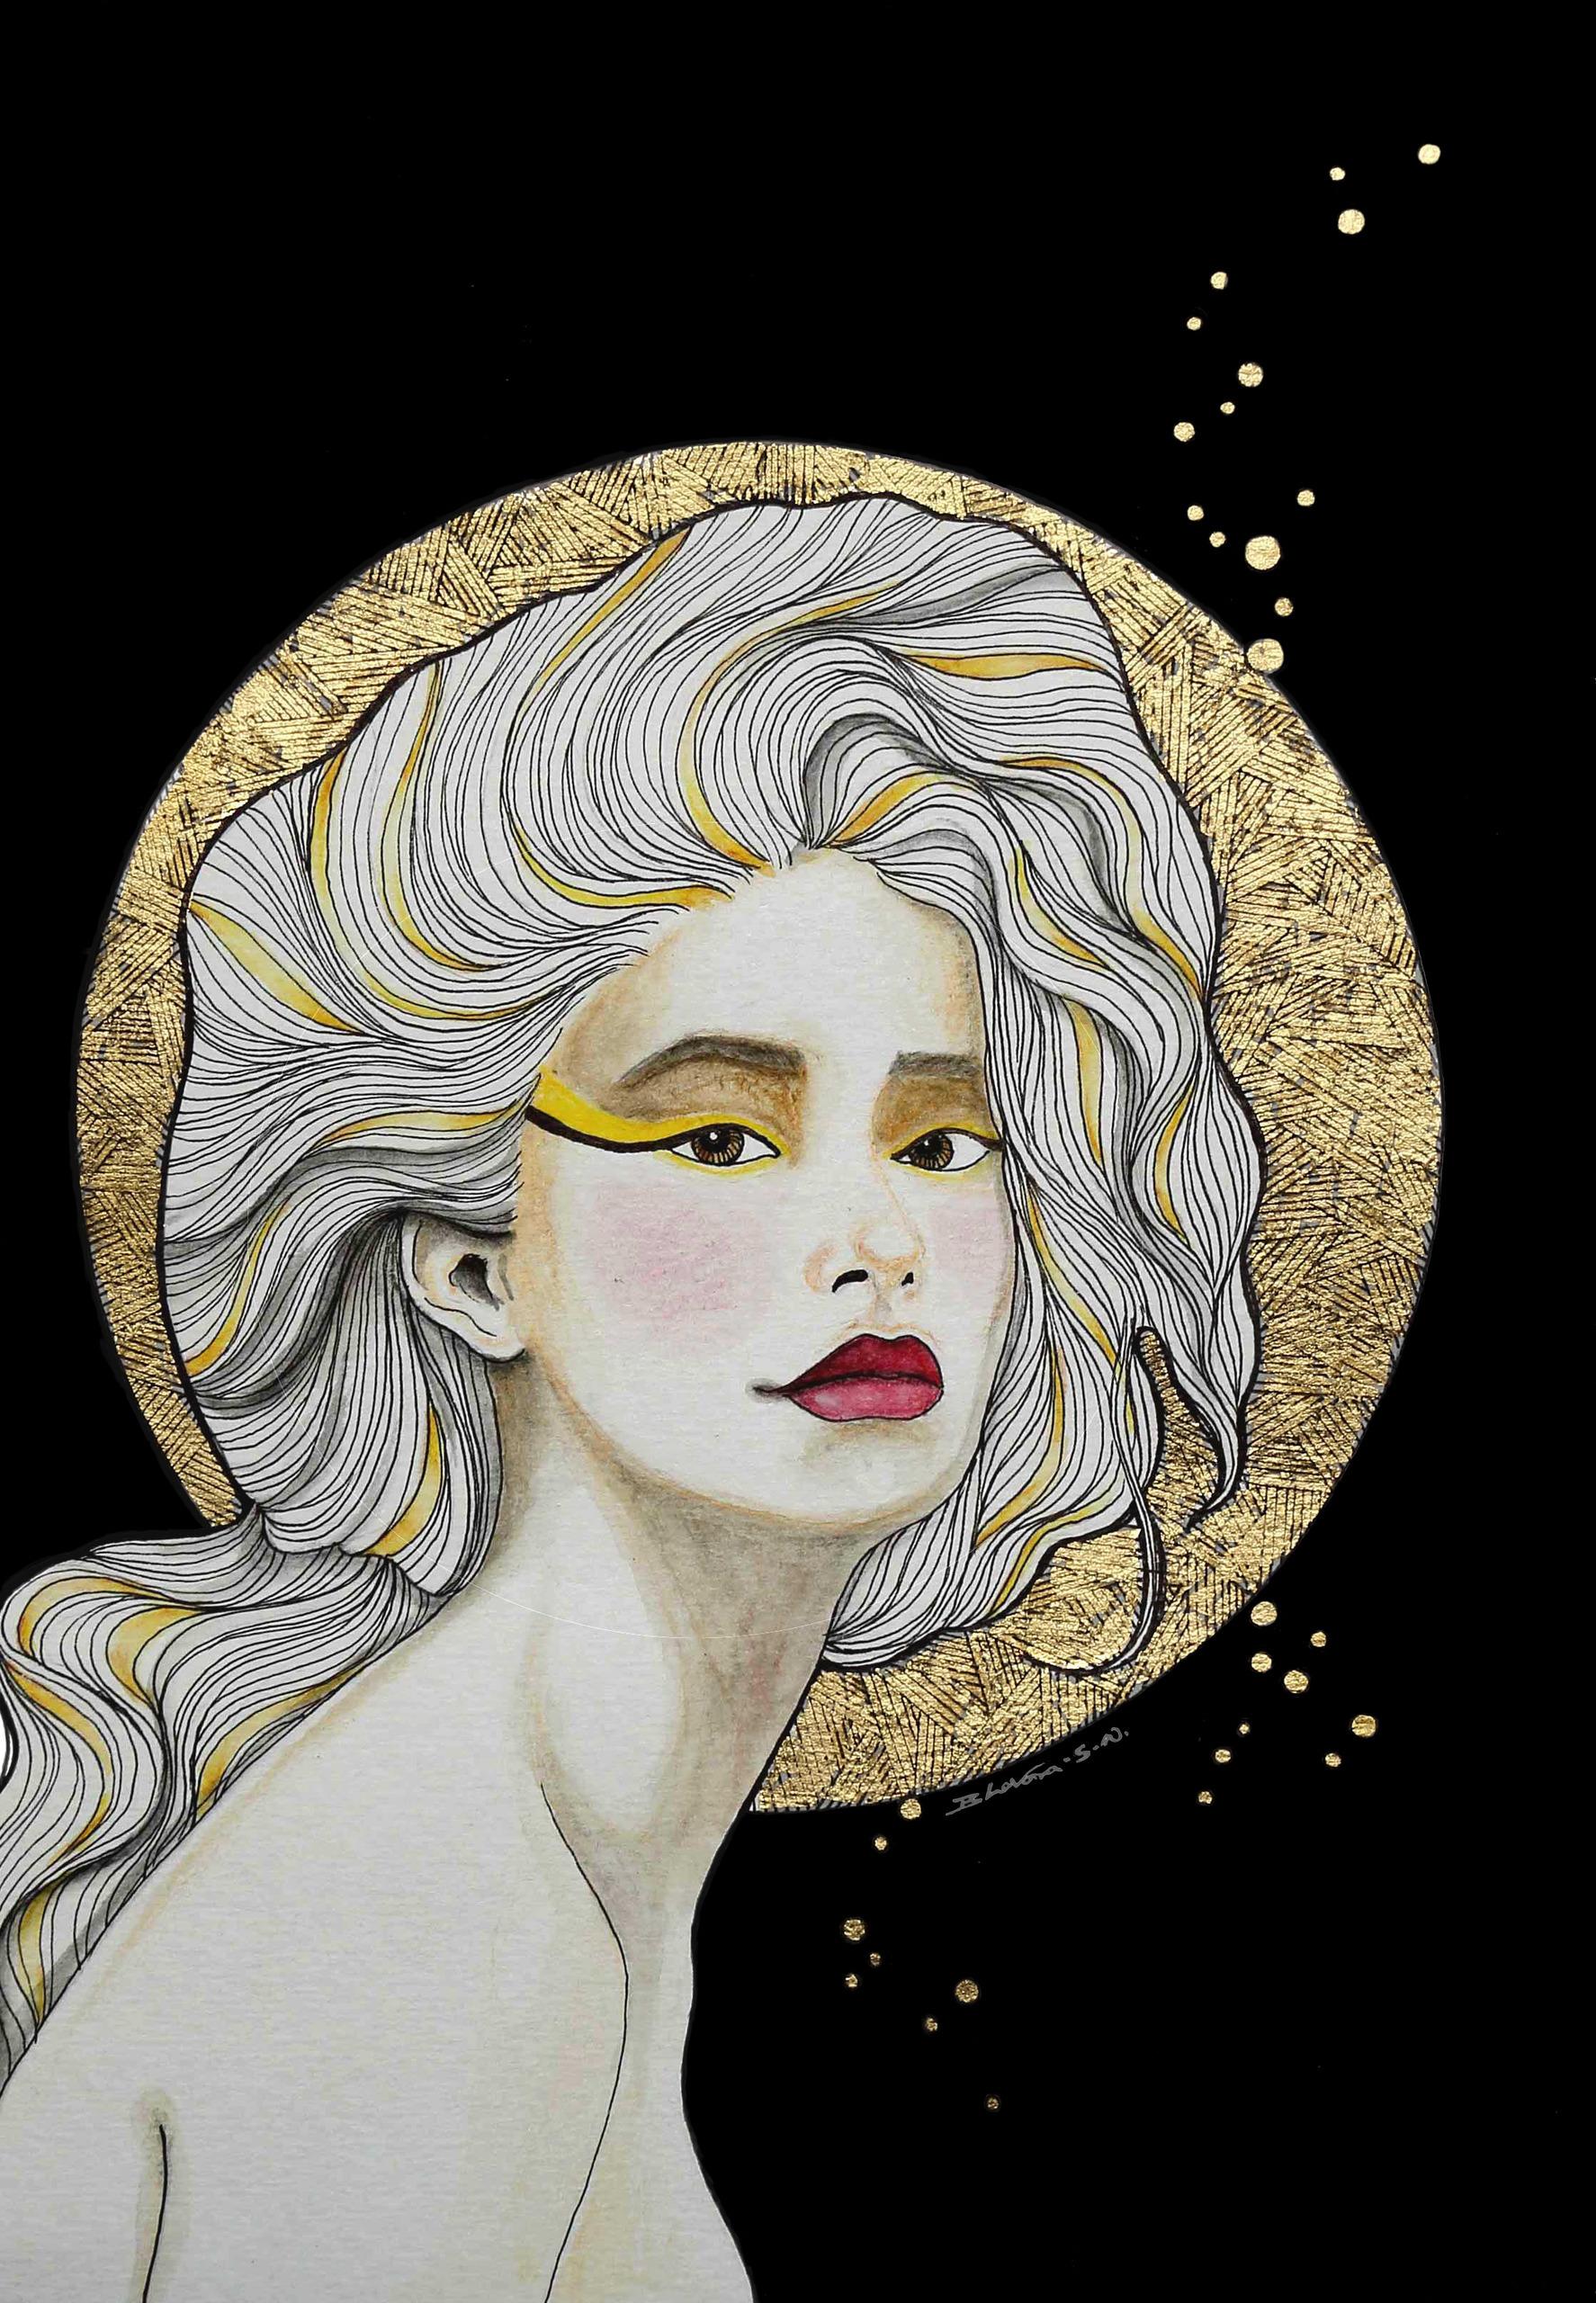 Flavia - lady, illustration, goldleaf - bhavanasn | ello